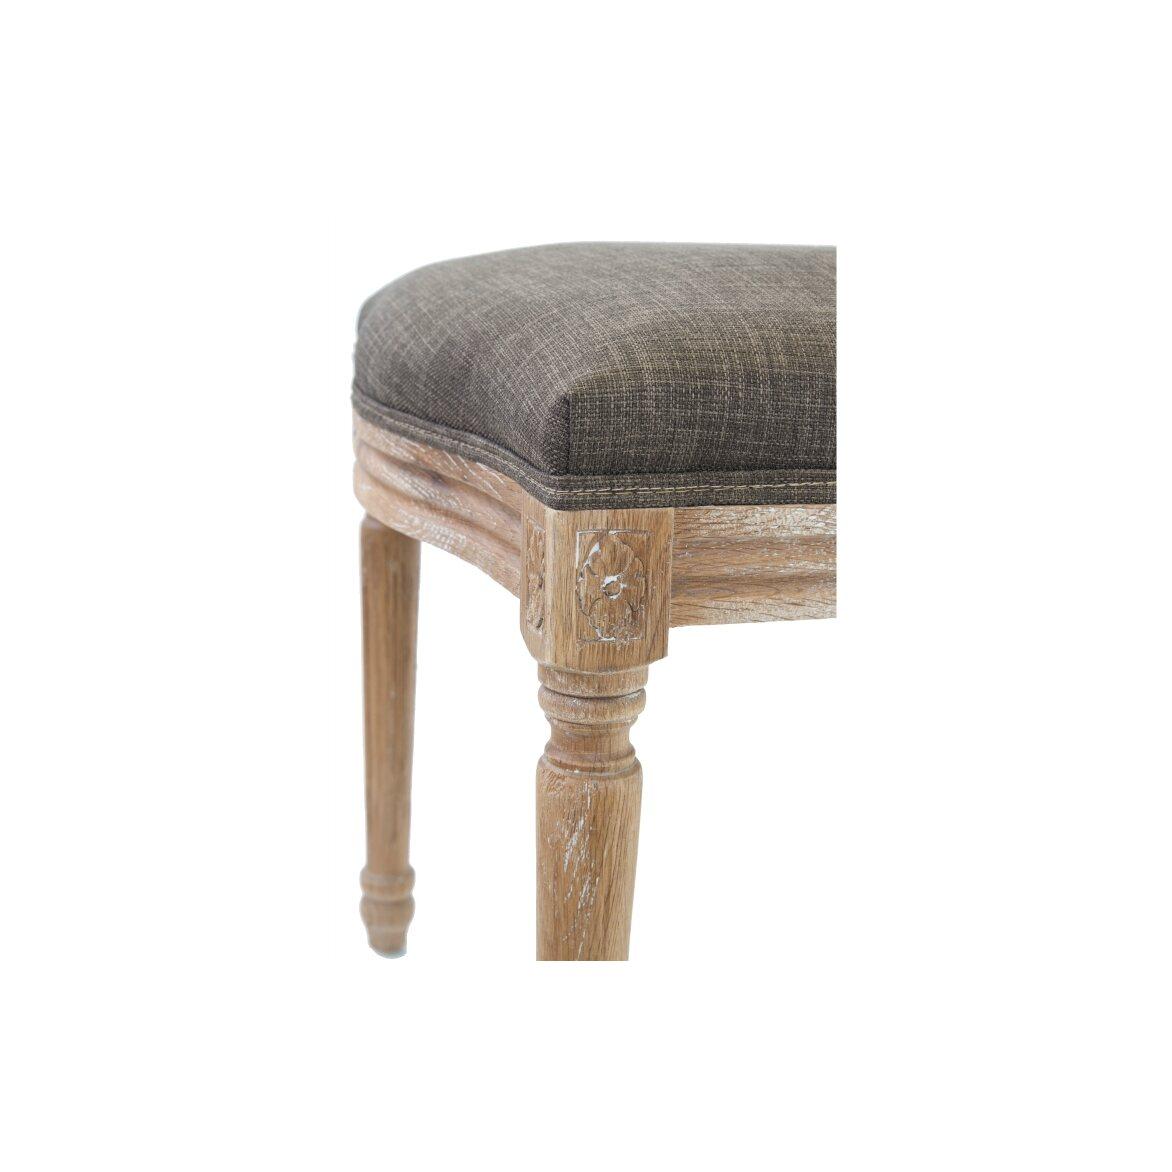 Стул Miro brown 5 | Обеденные стулья Kingsby